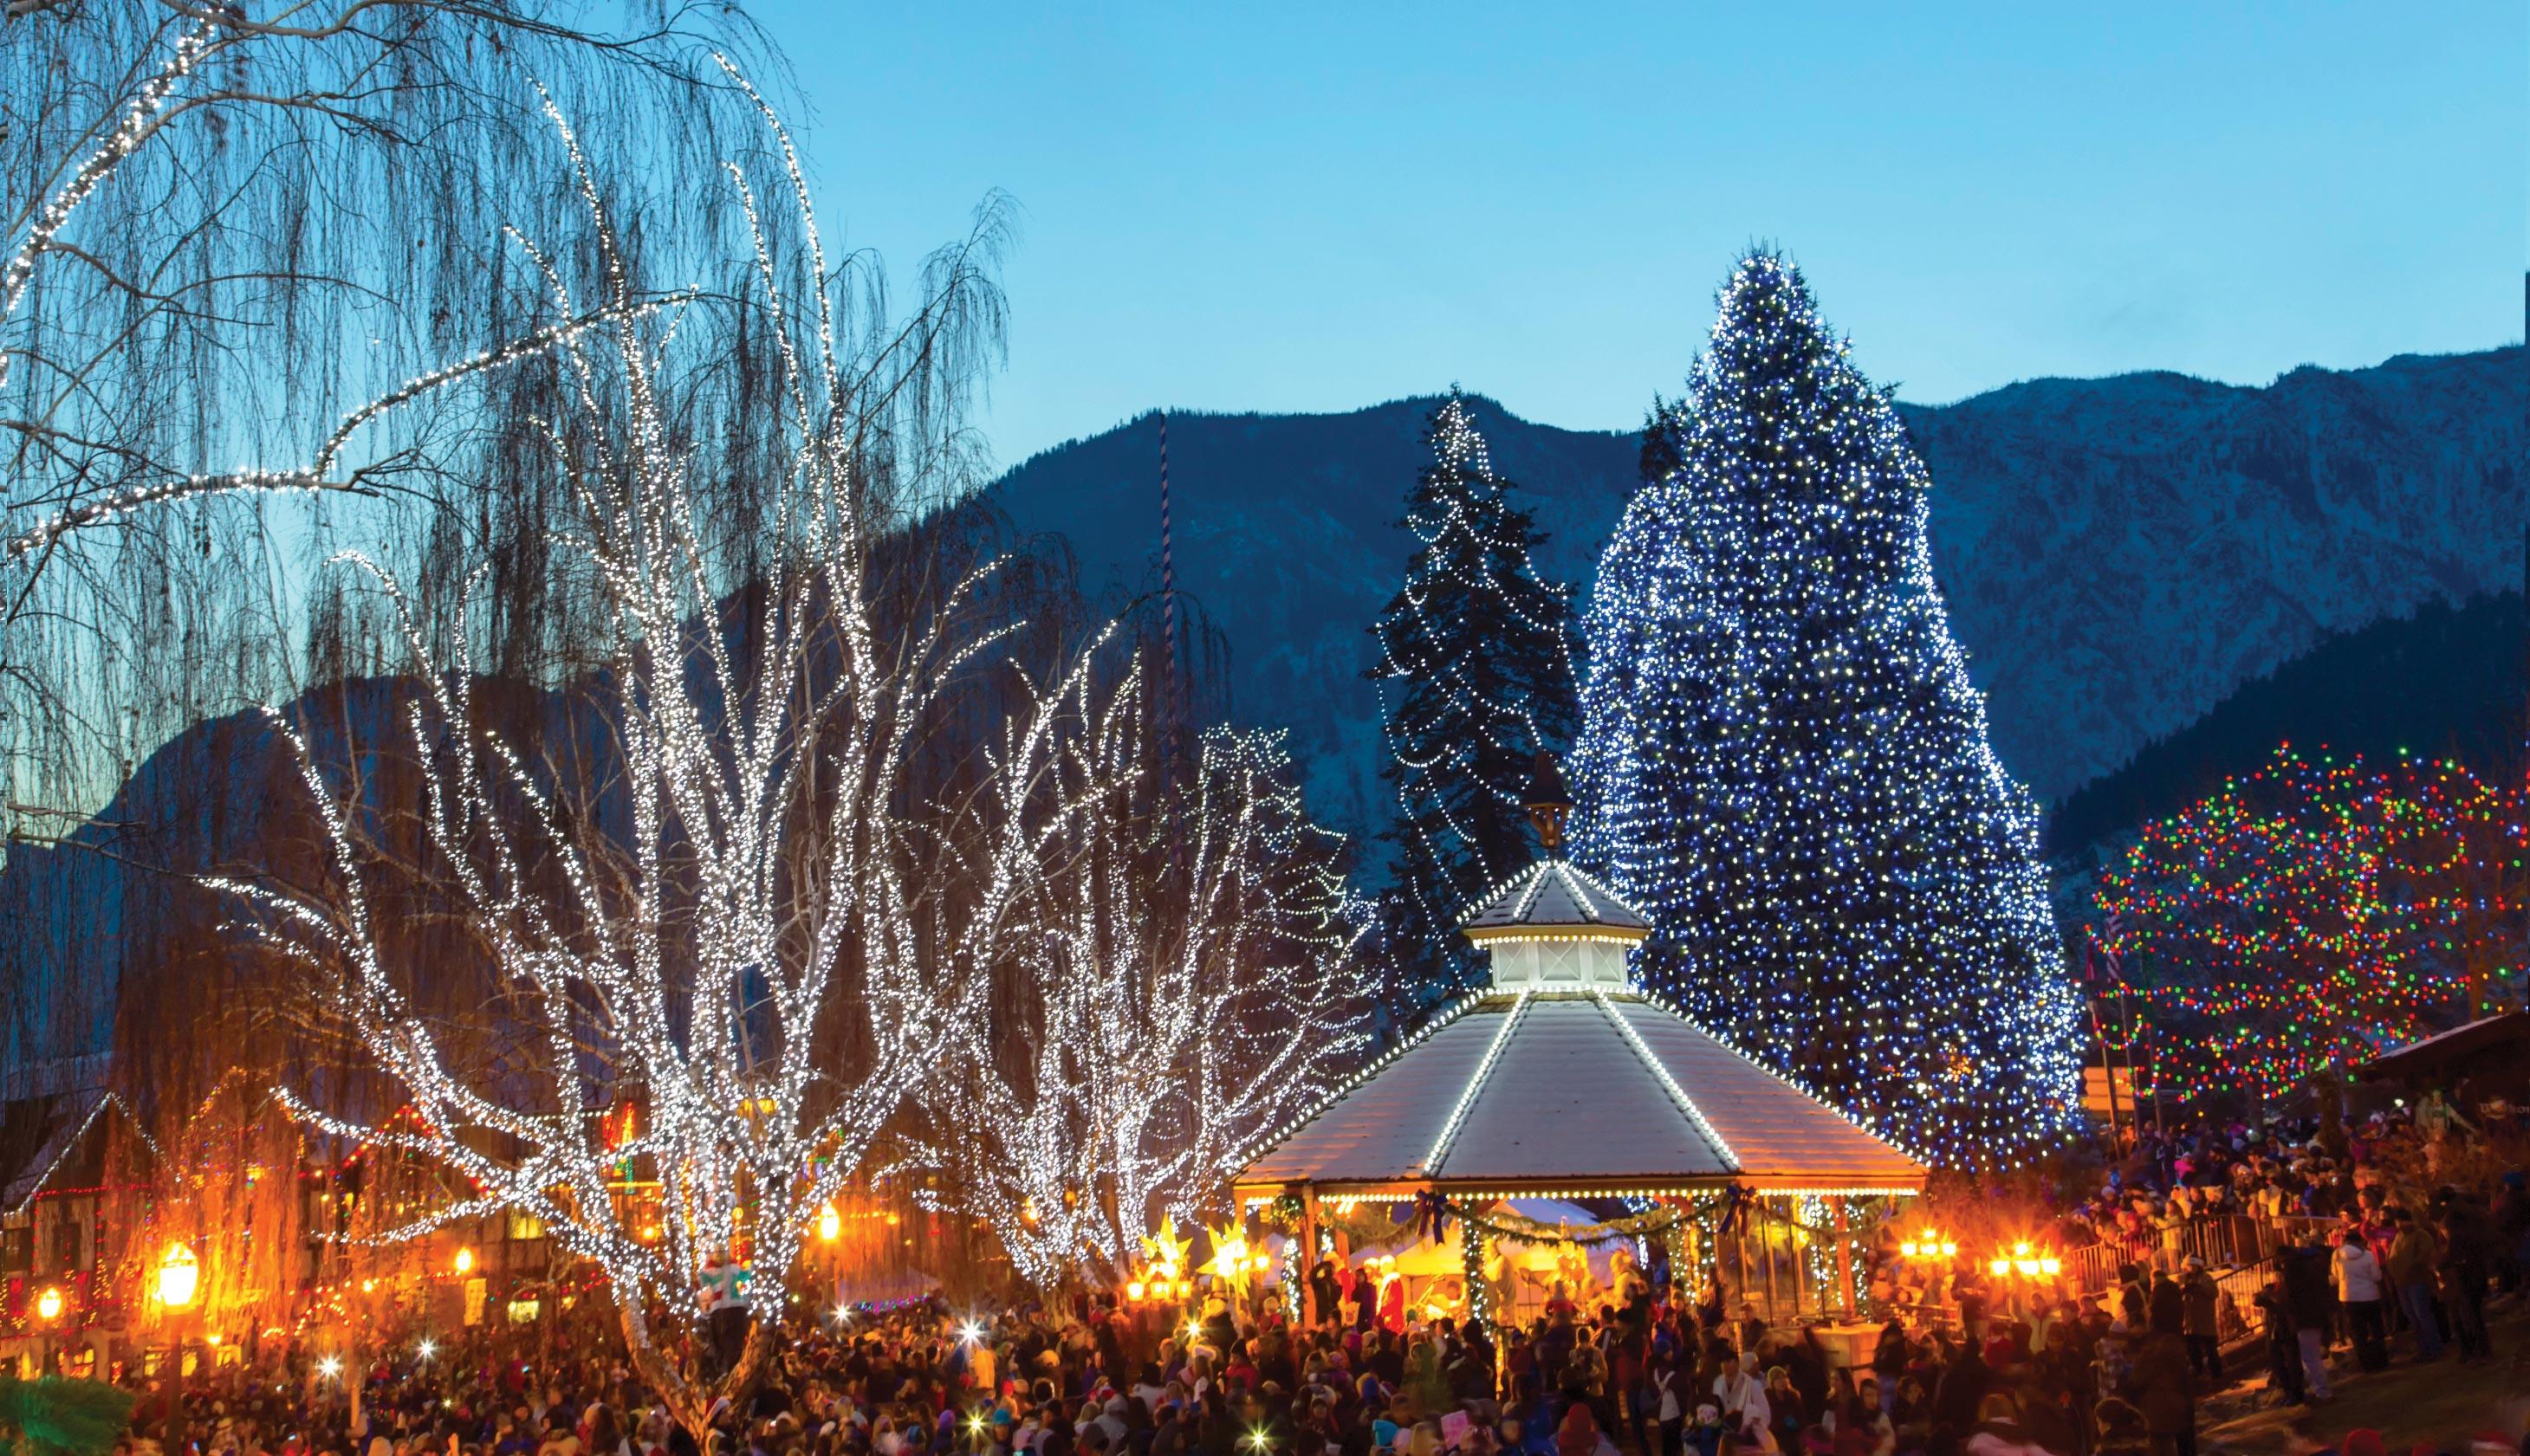 Leavenworth Christmas Tree Lighting  Leavenworth Christmas Lighting Festival with Bellevue